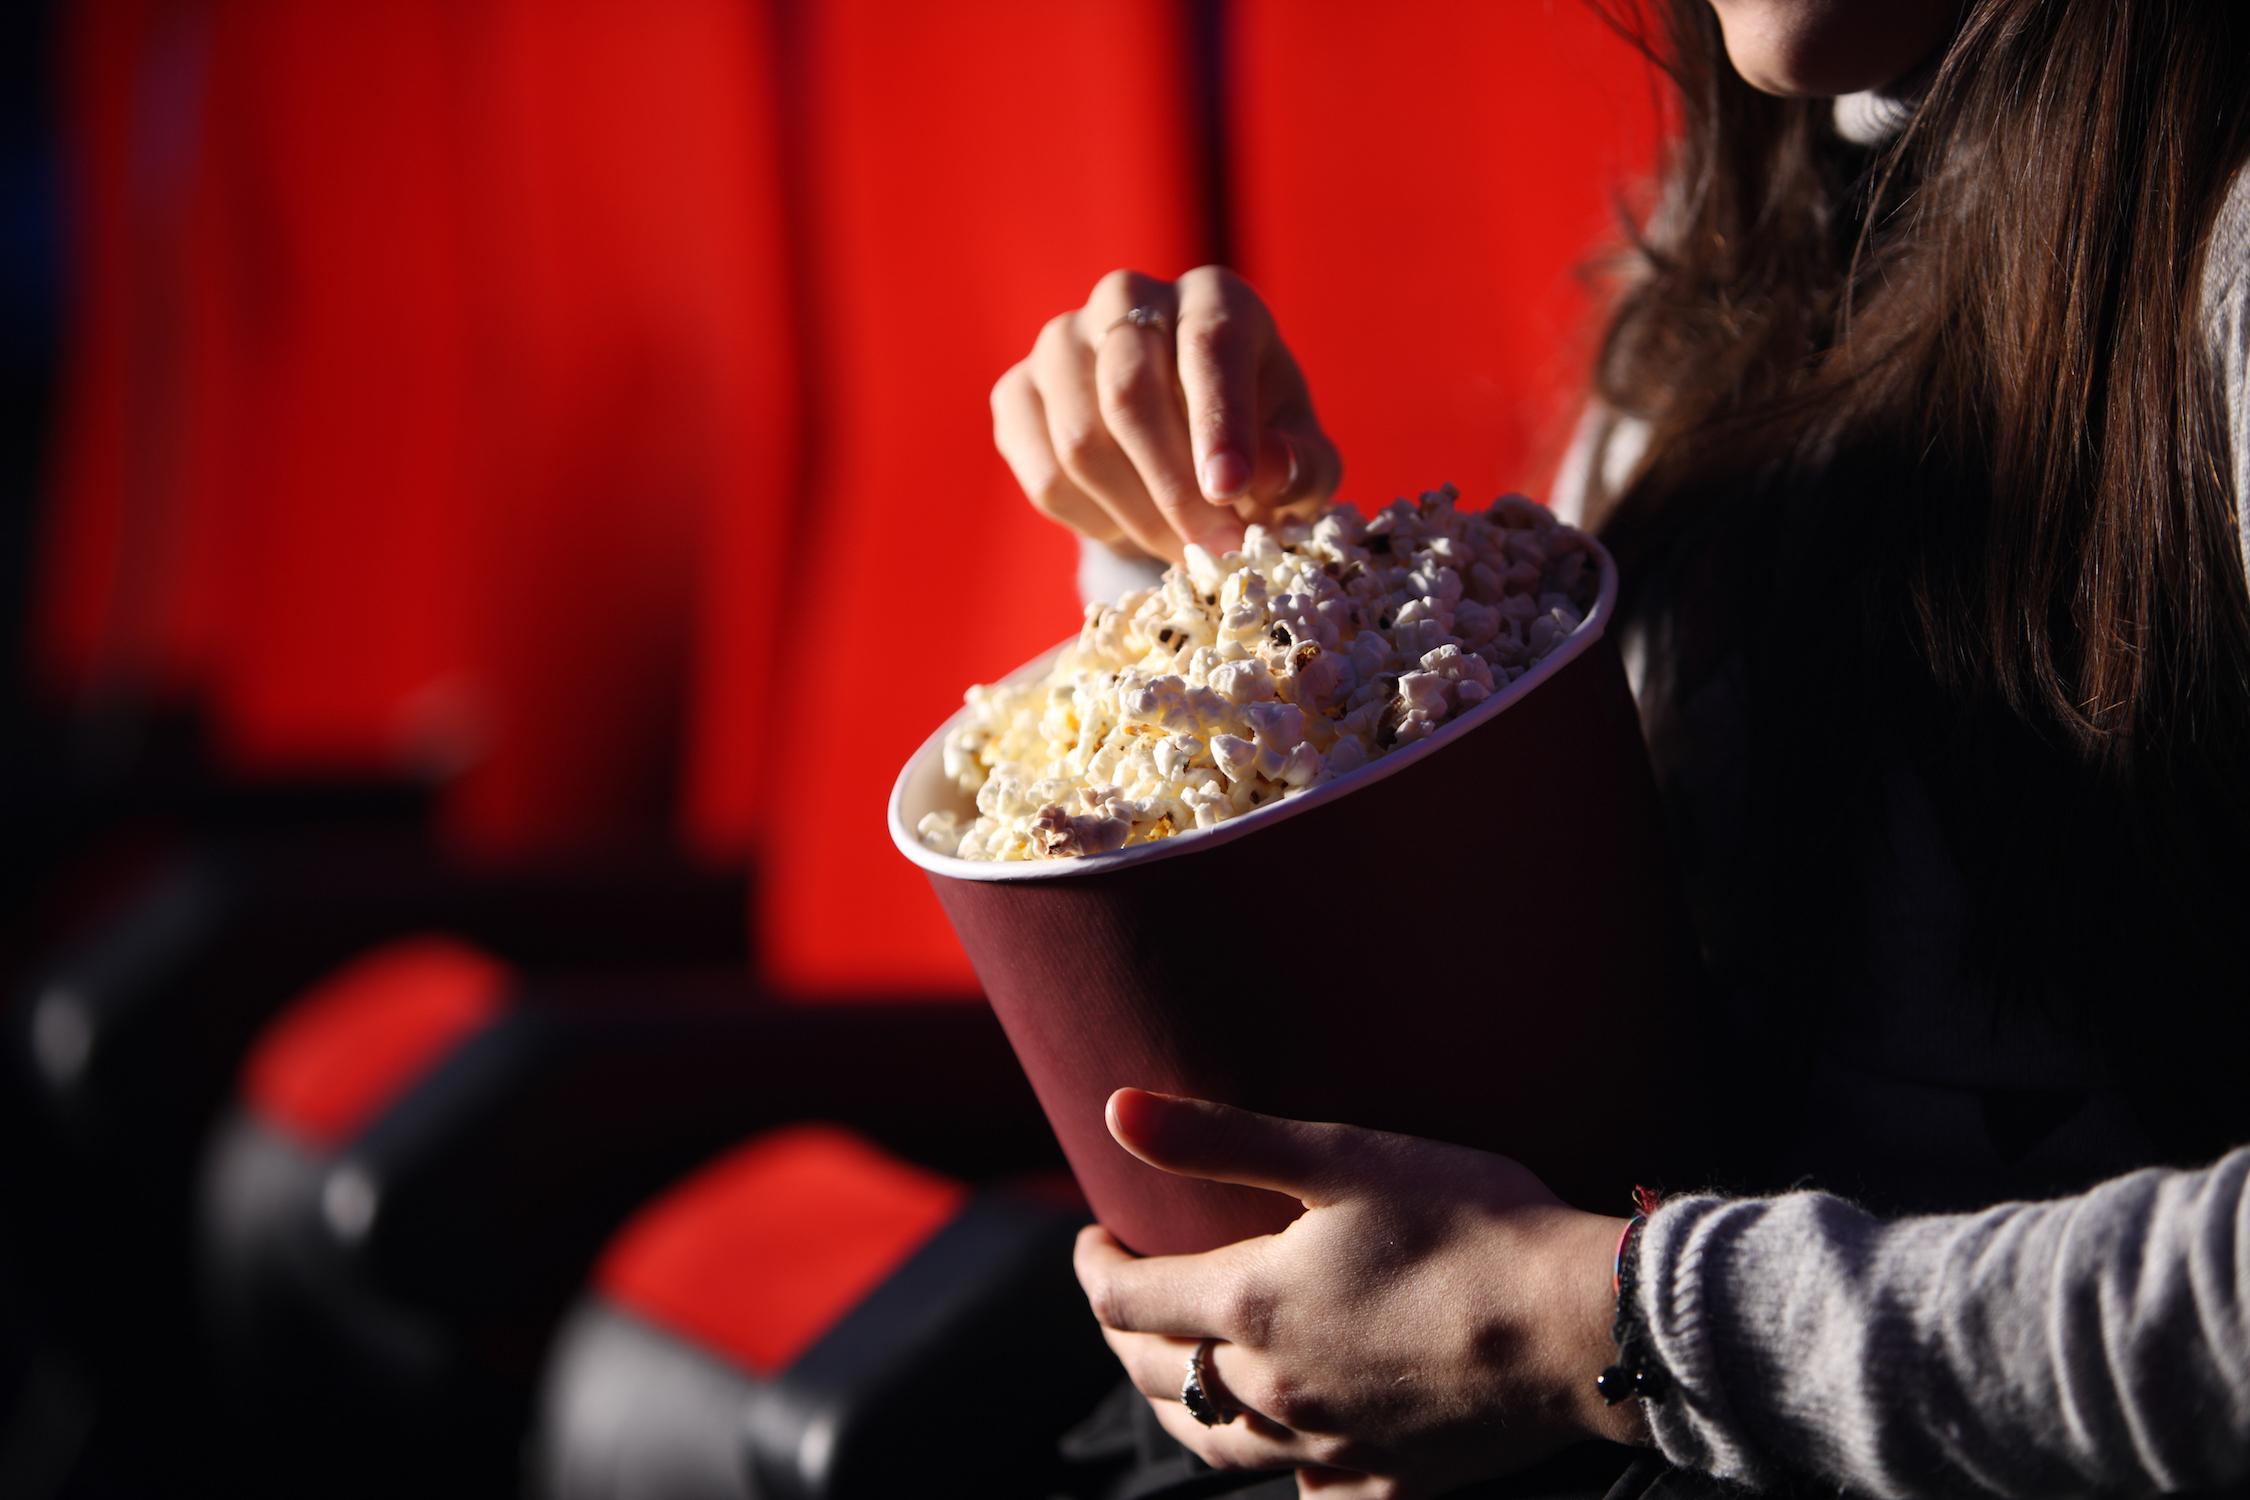 cinema, movie